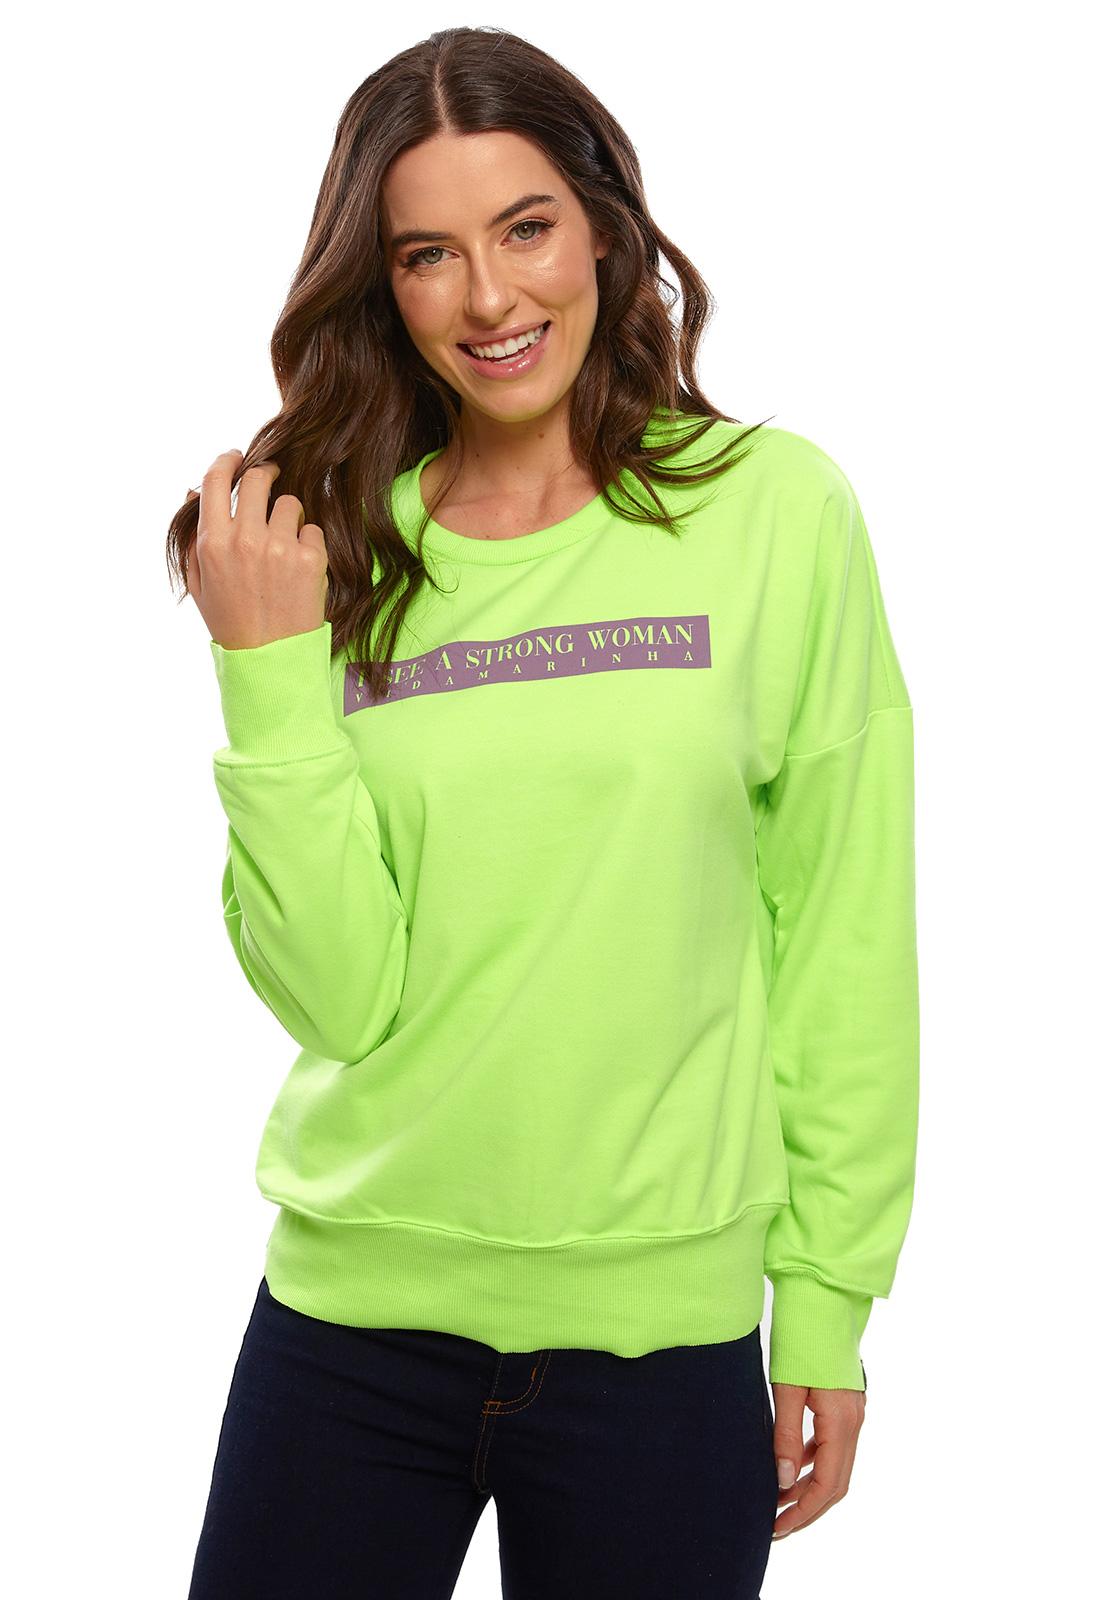 Blusa de Moletom Vida Marinha Gola Redonda Verde Neon